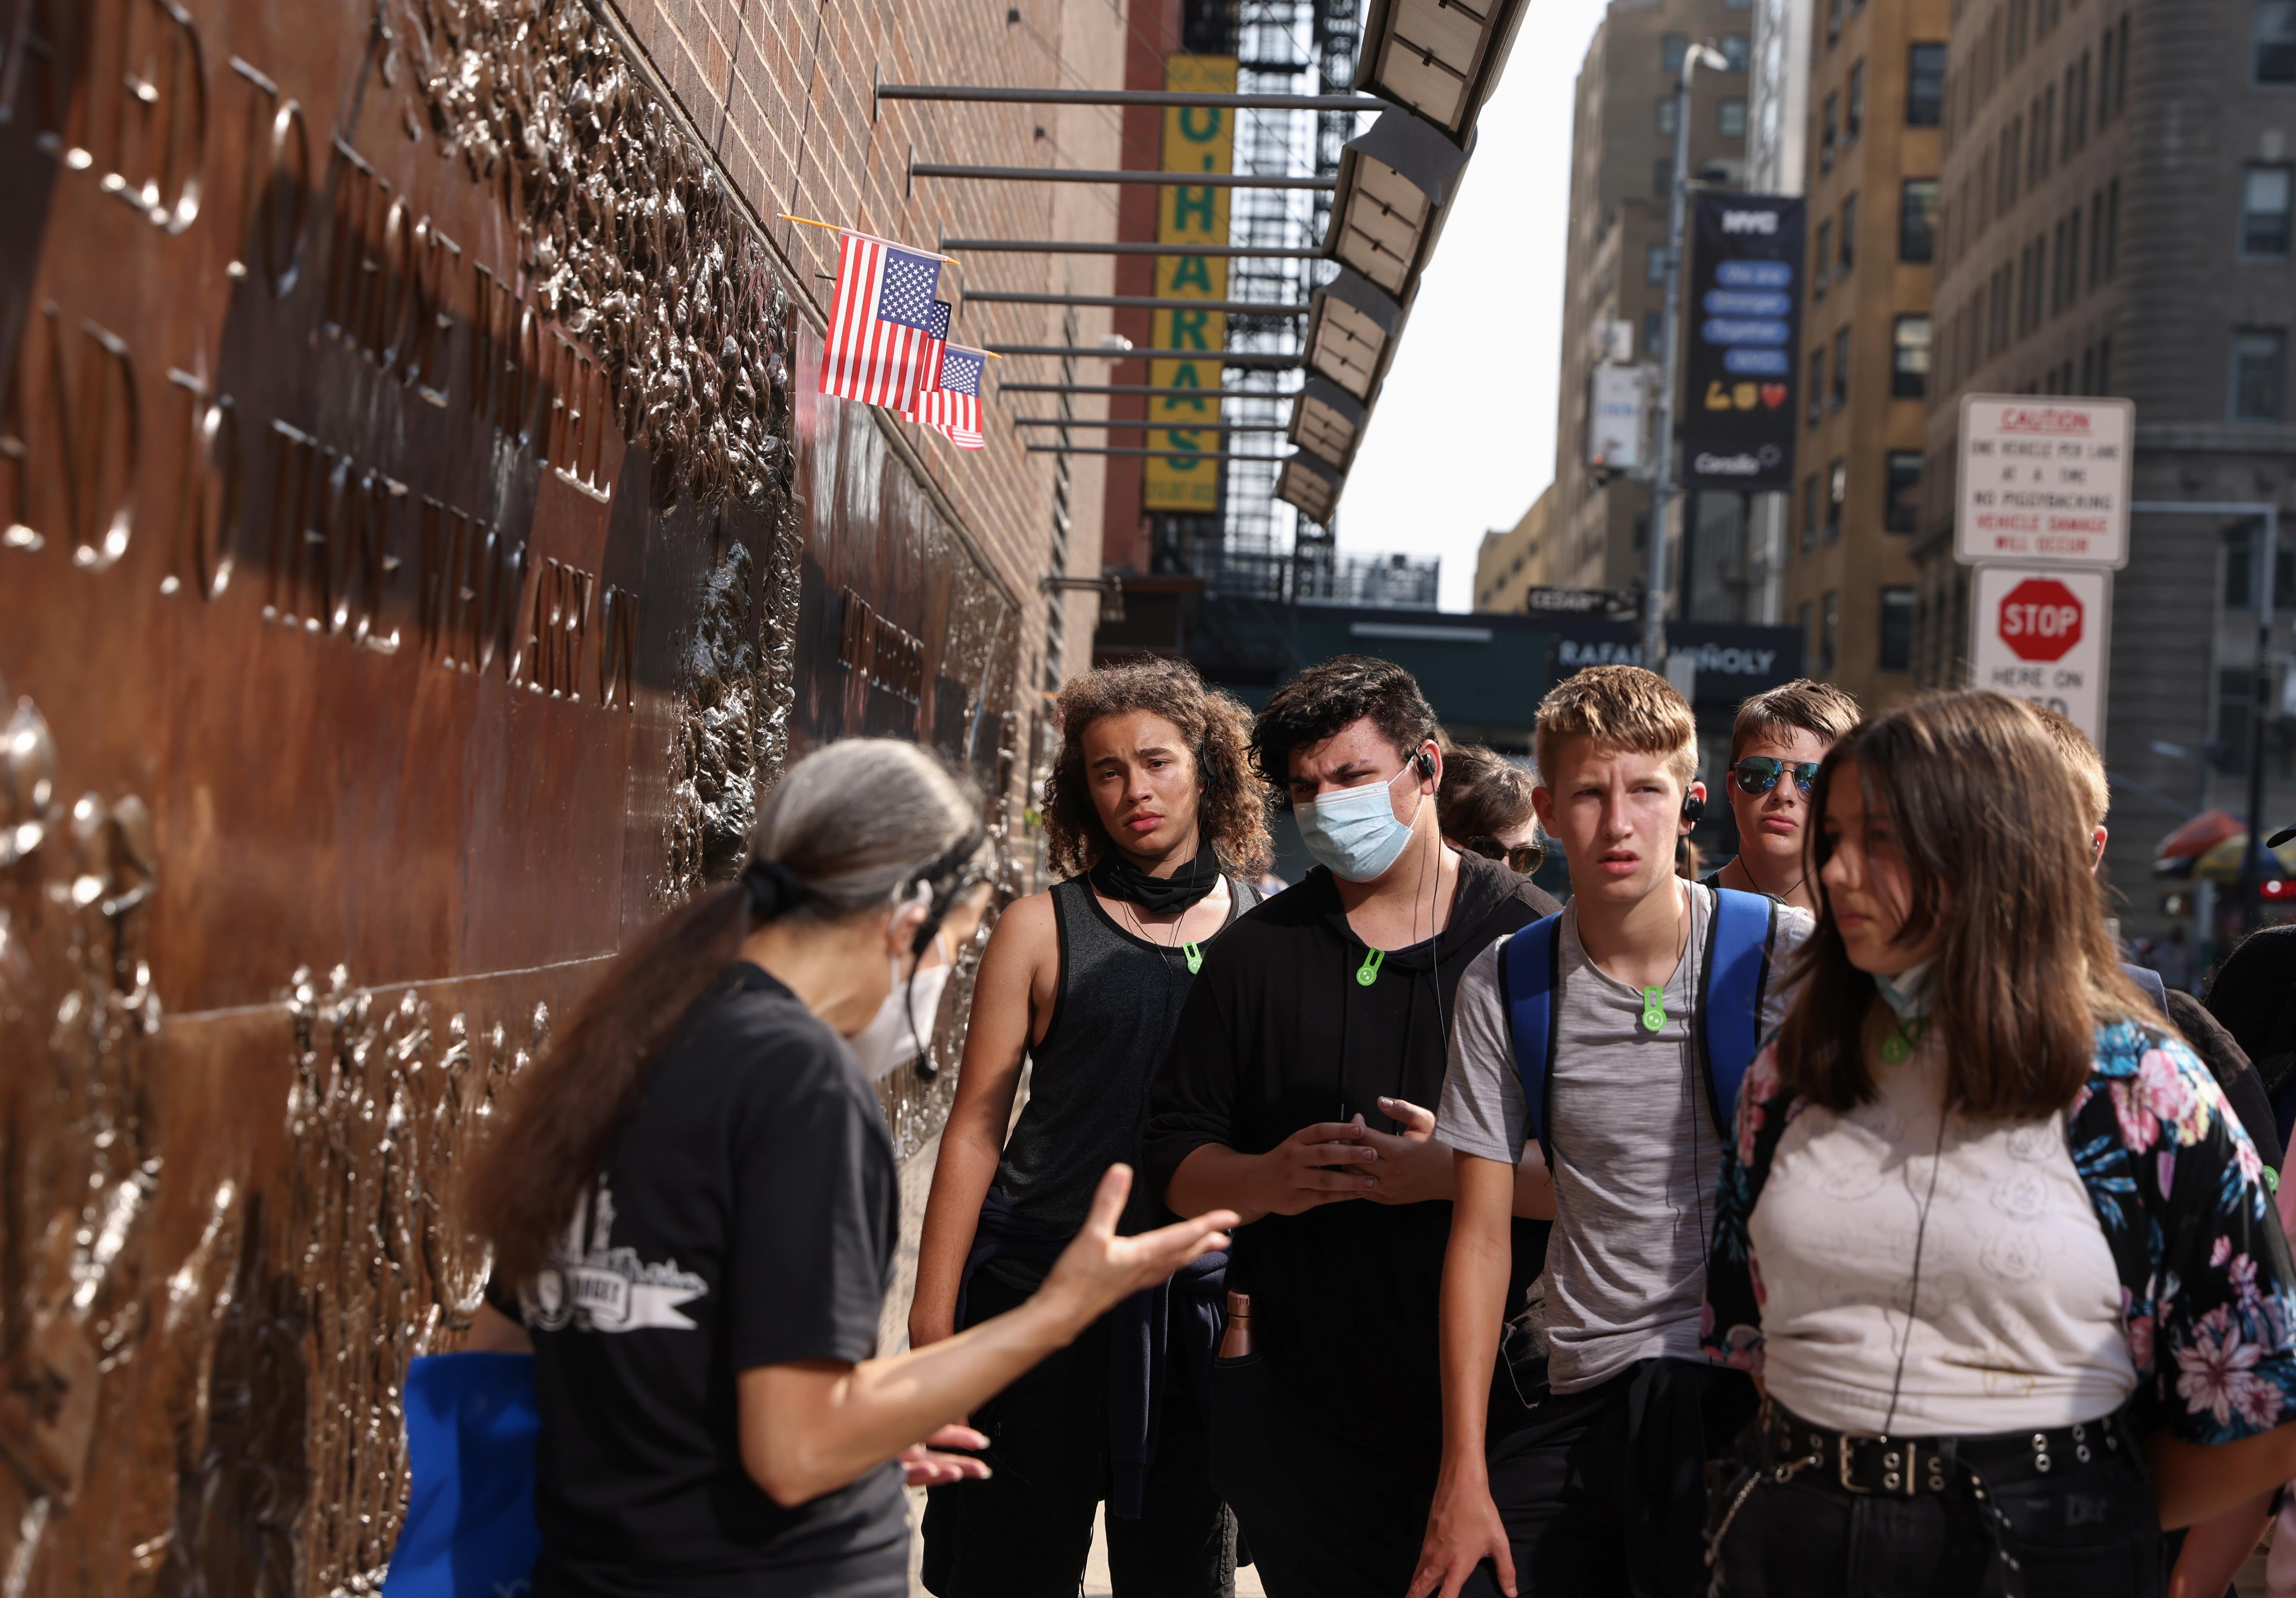 (L-R) Students Zavion Turner, Elijah Johnson, Colin Dukes, and Gillian Rodriguez-Lentz, listen to docent Joan Mastropaolo explain a memorial outside the 9/11 Tribute Museum in New York City, U.S., August 26, 2021. REUTERS/Caitlin Ochs